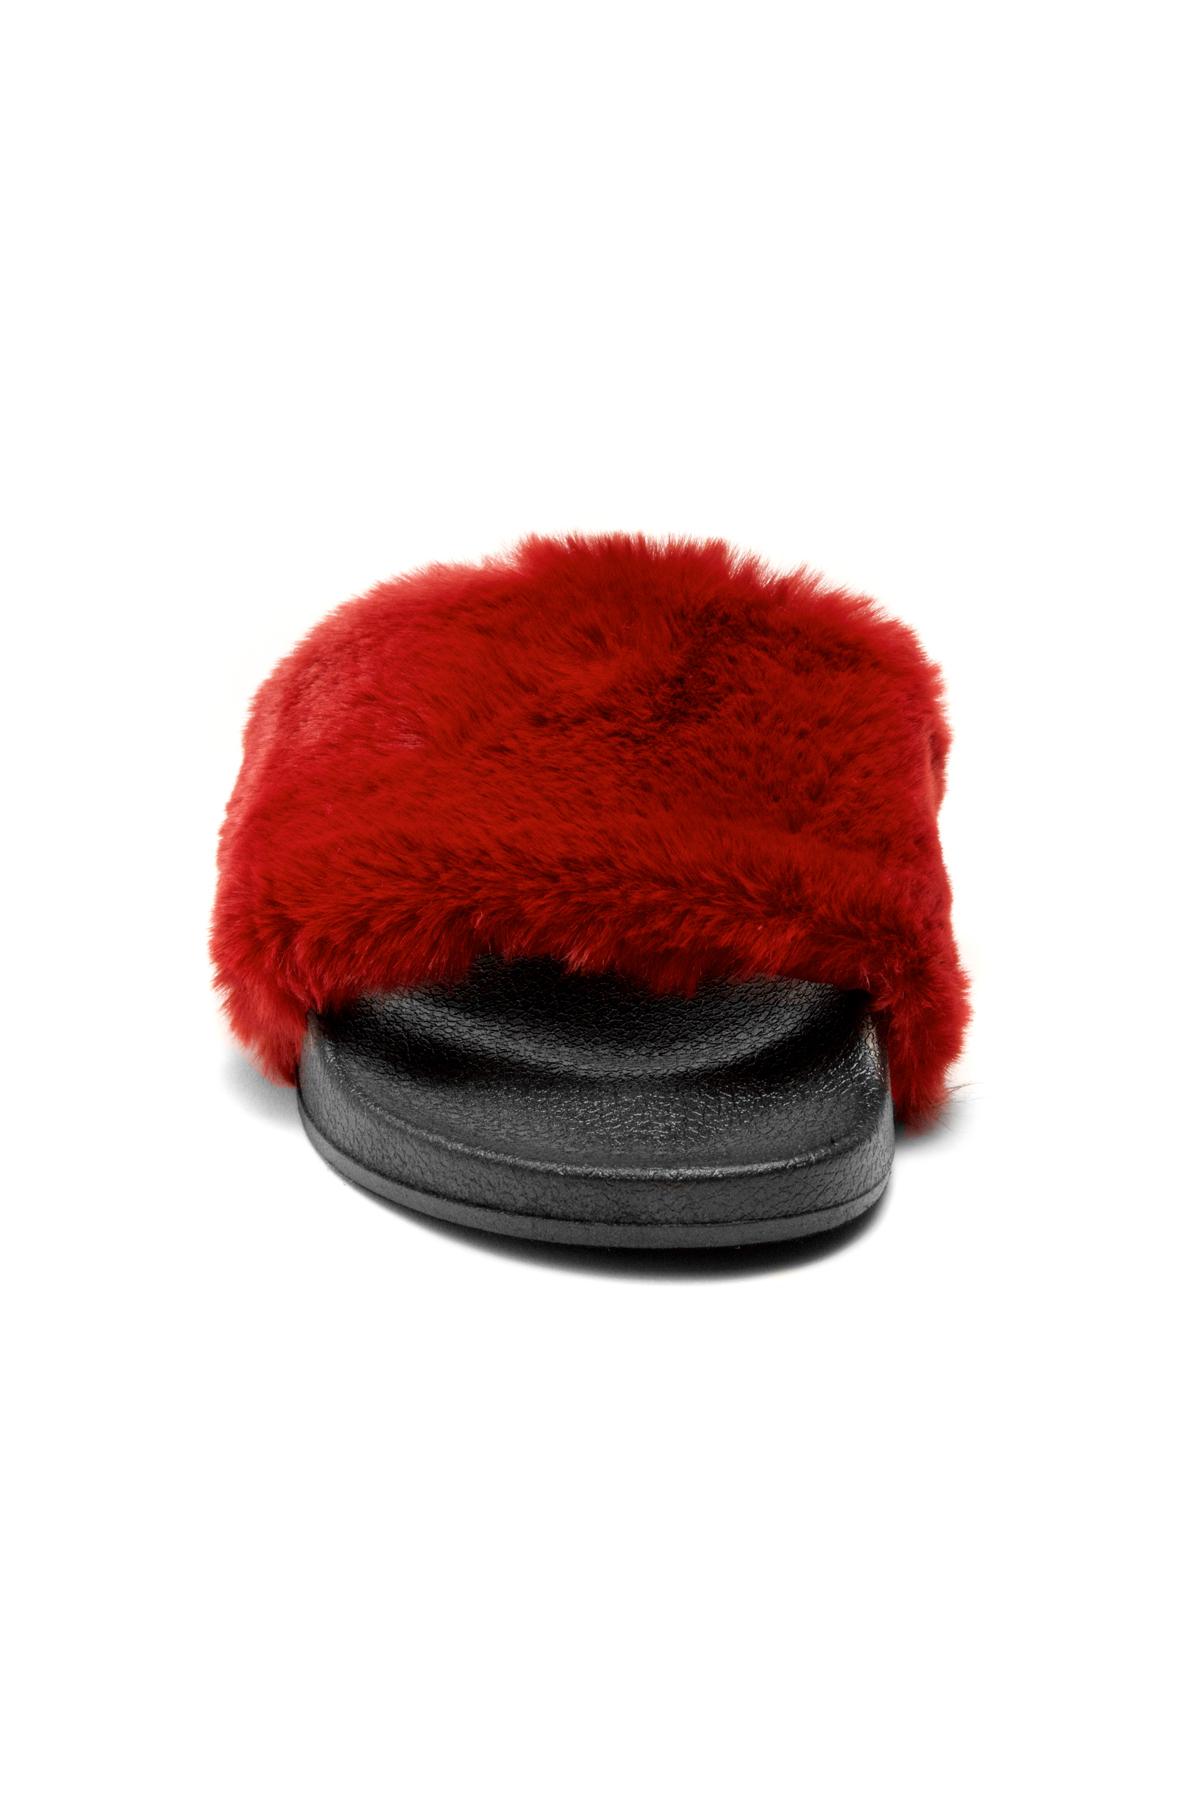 1bec4848f13c Herstyle Women s SL-160801 Faux Fur Slide Sandal(Burgundy)